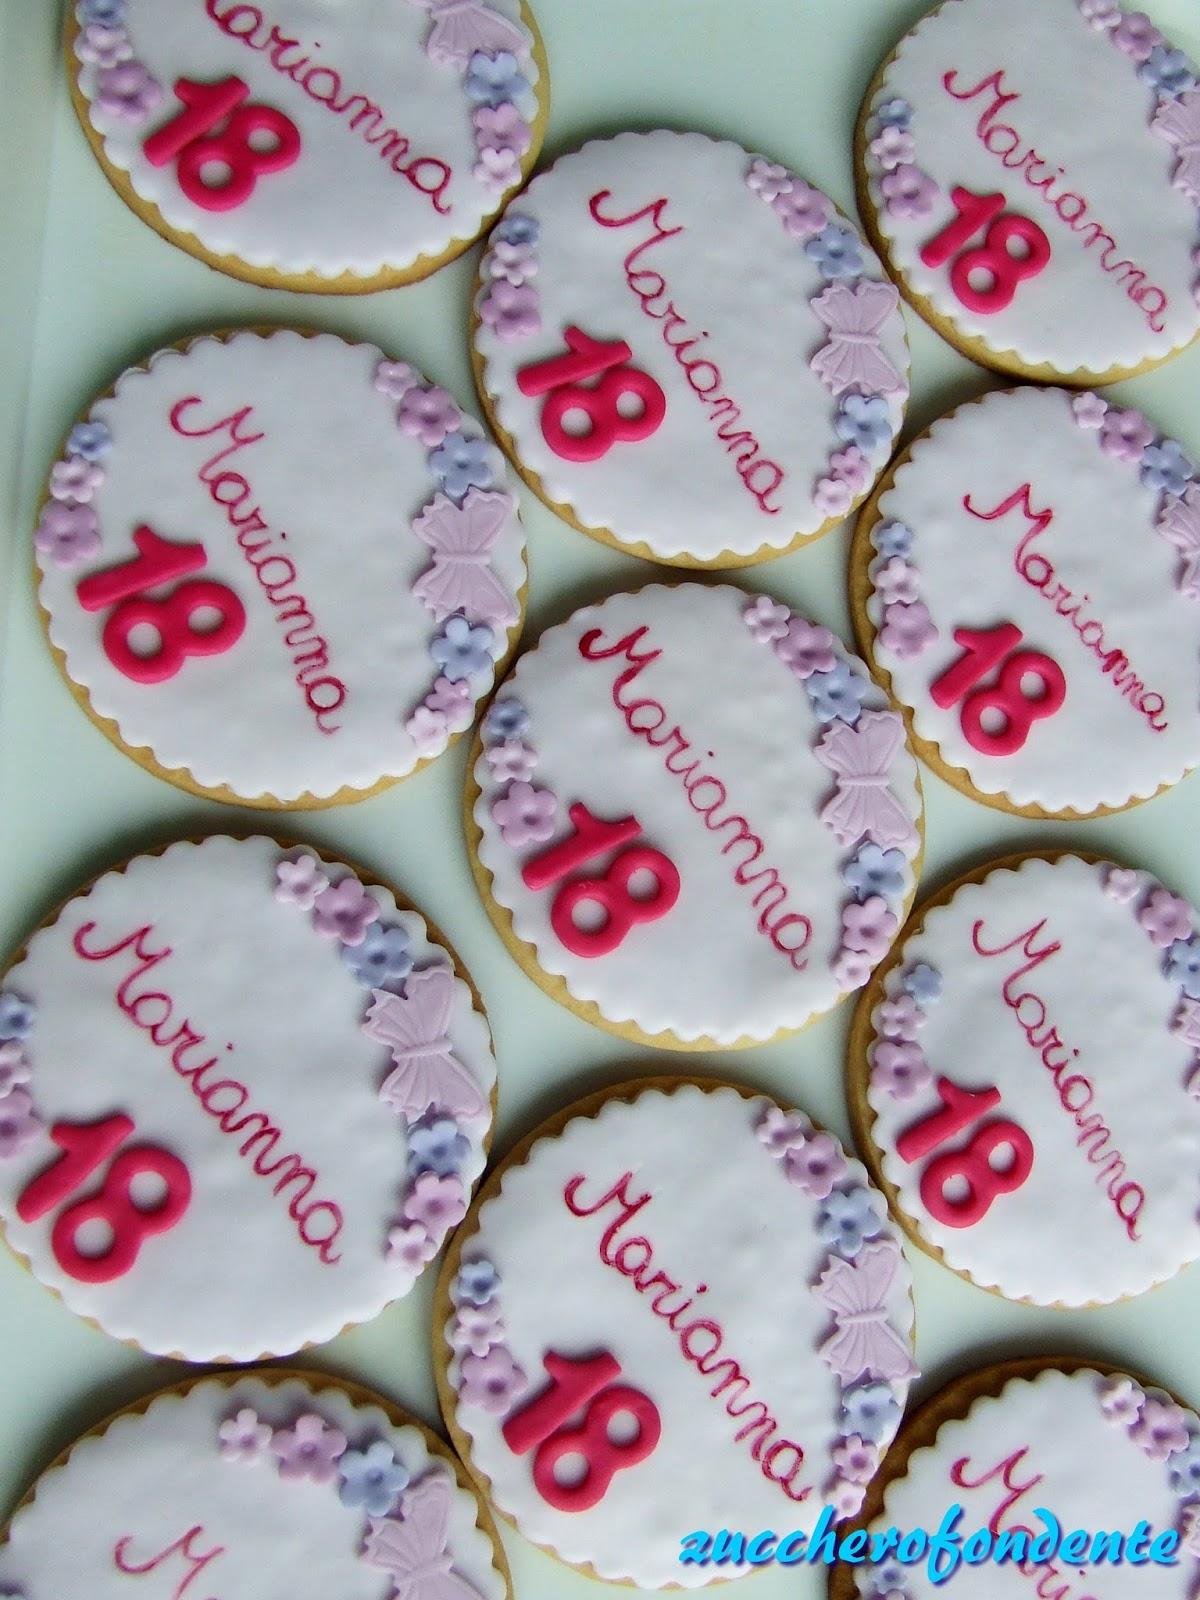 Zuccherofondente Biscotti Decorati 18 Anni